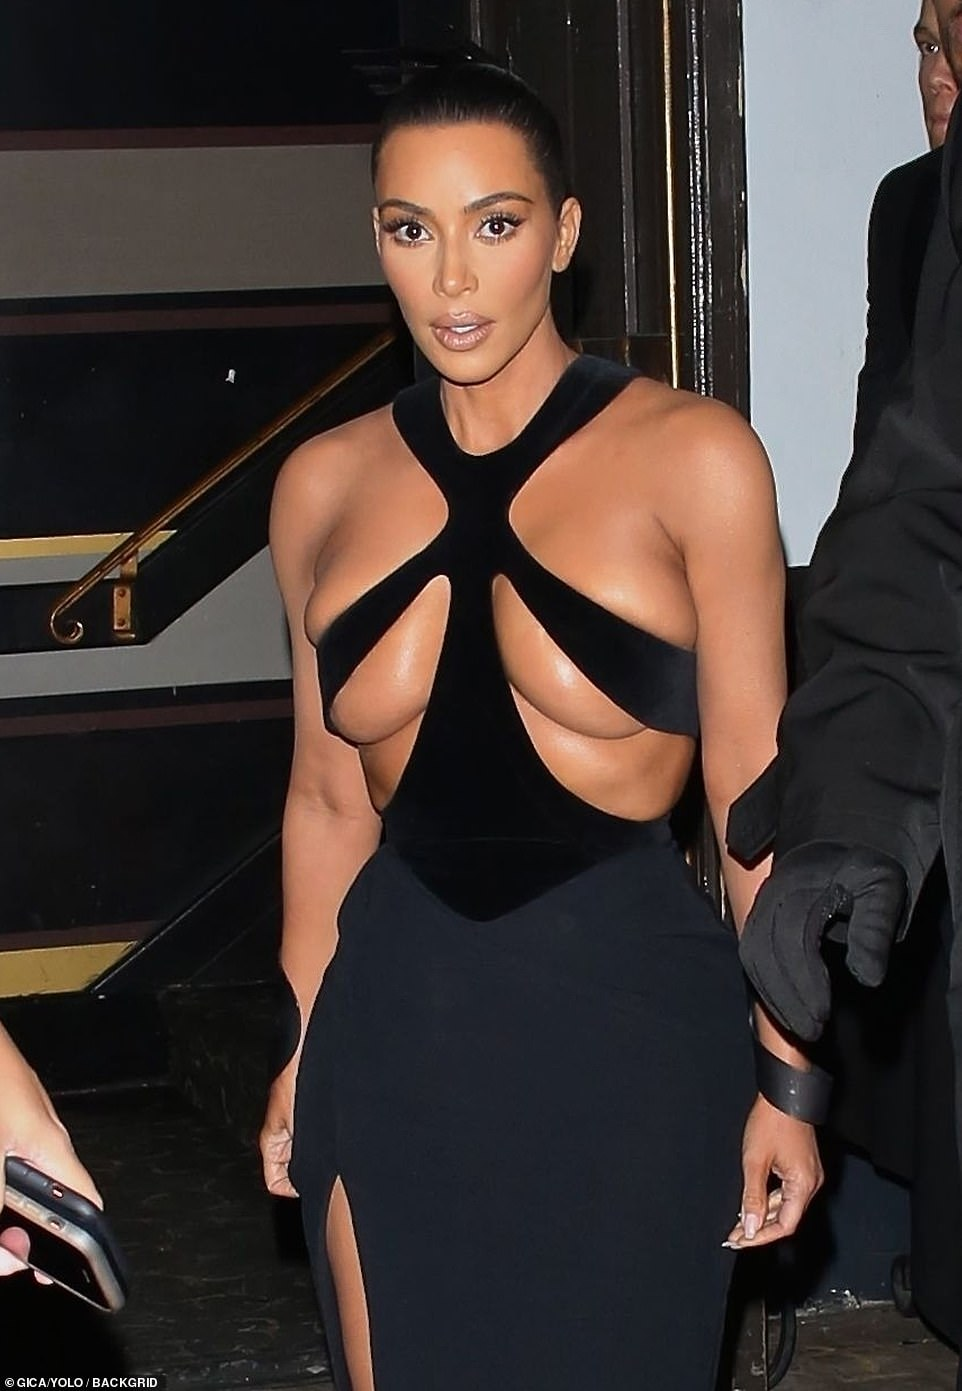 Kim Kardashian shfaqet mjaft provokuese (Foto)